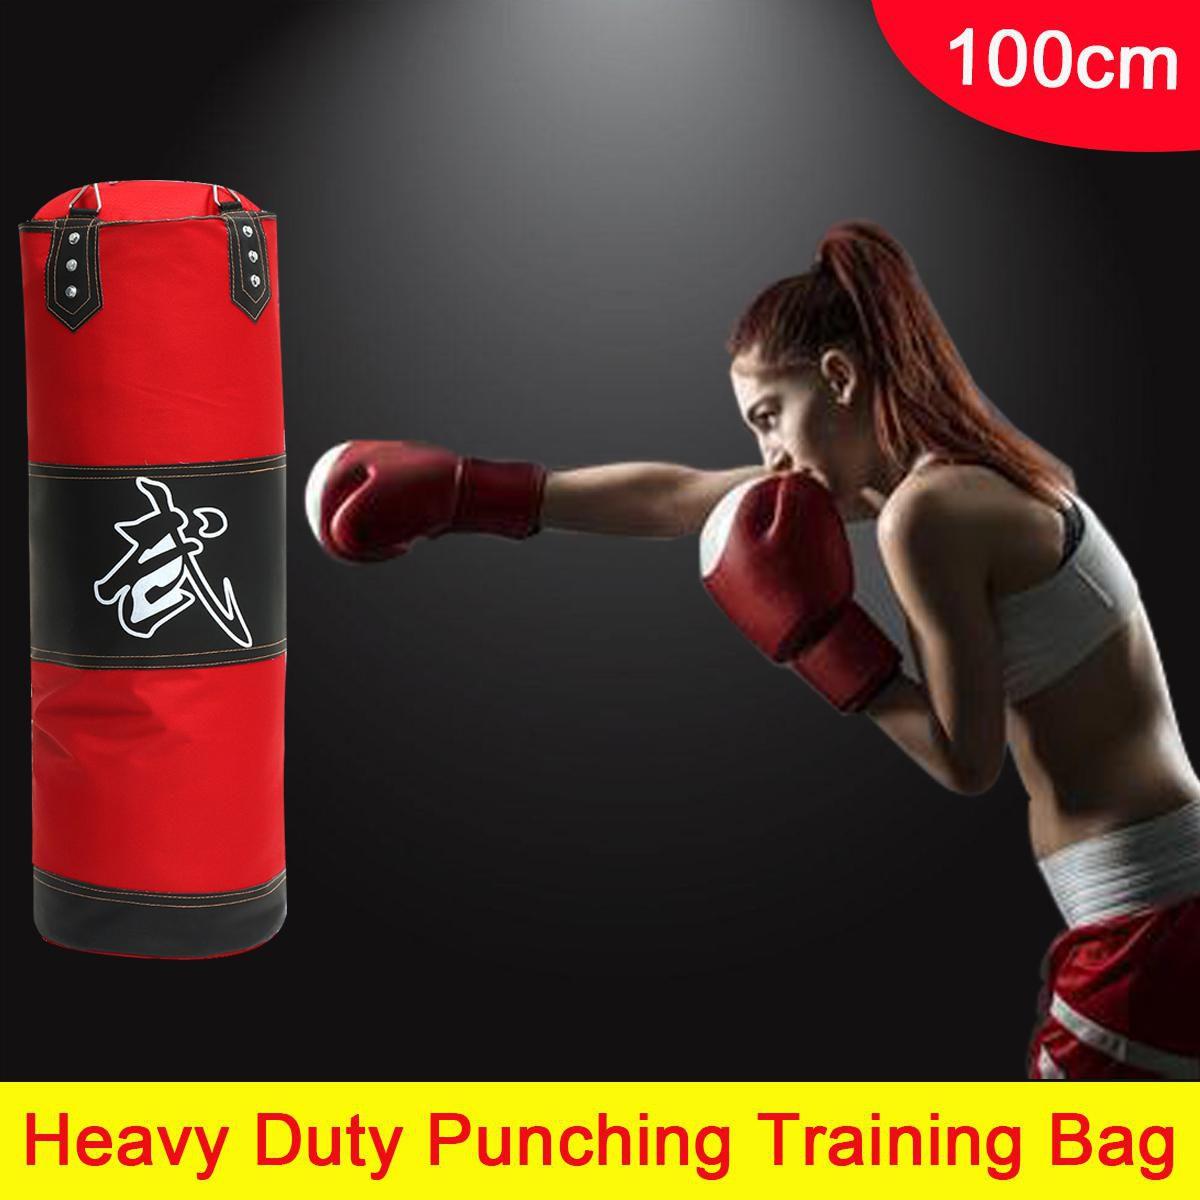 100cm Training MMA Boxing Hook Kick Sandbag Fight Karate Punch Punching Sand Bag